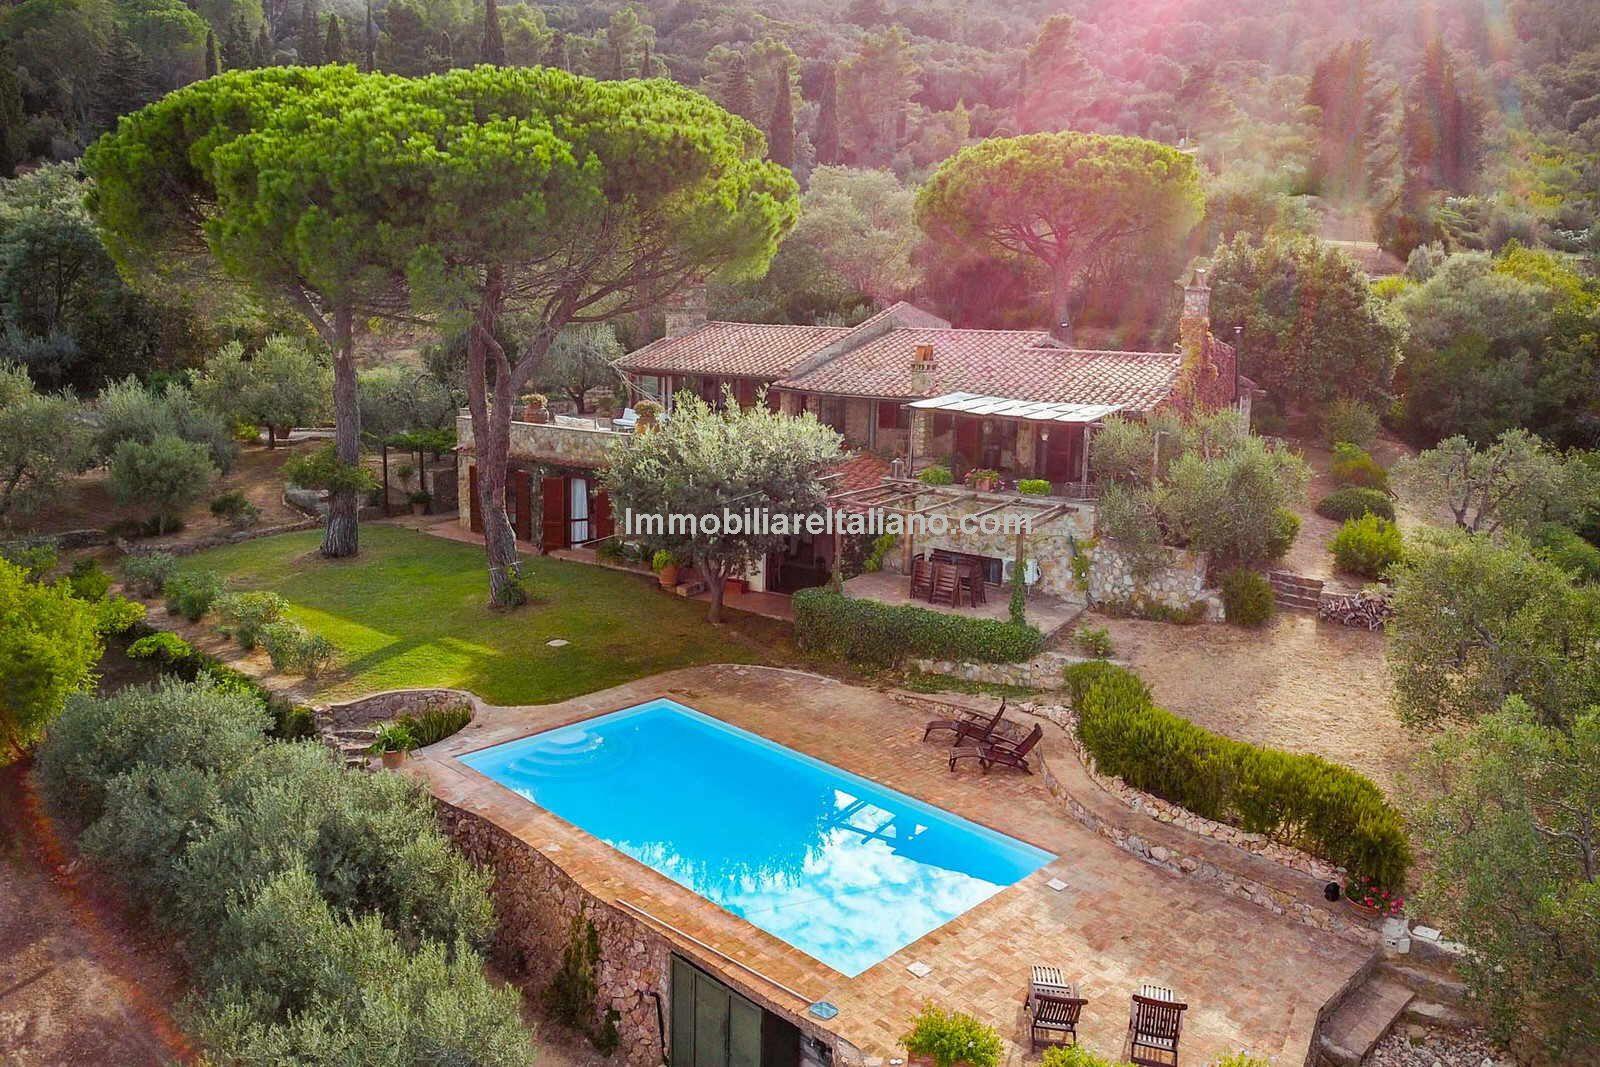 Italian coastal property for sale Tuscany Immobiliare Italiano